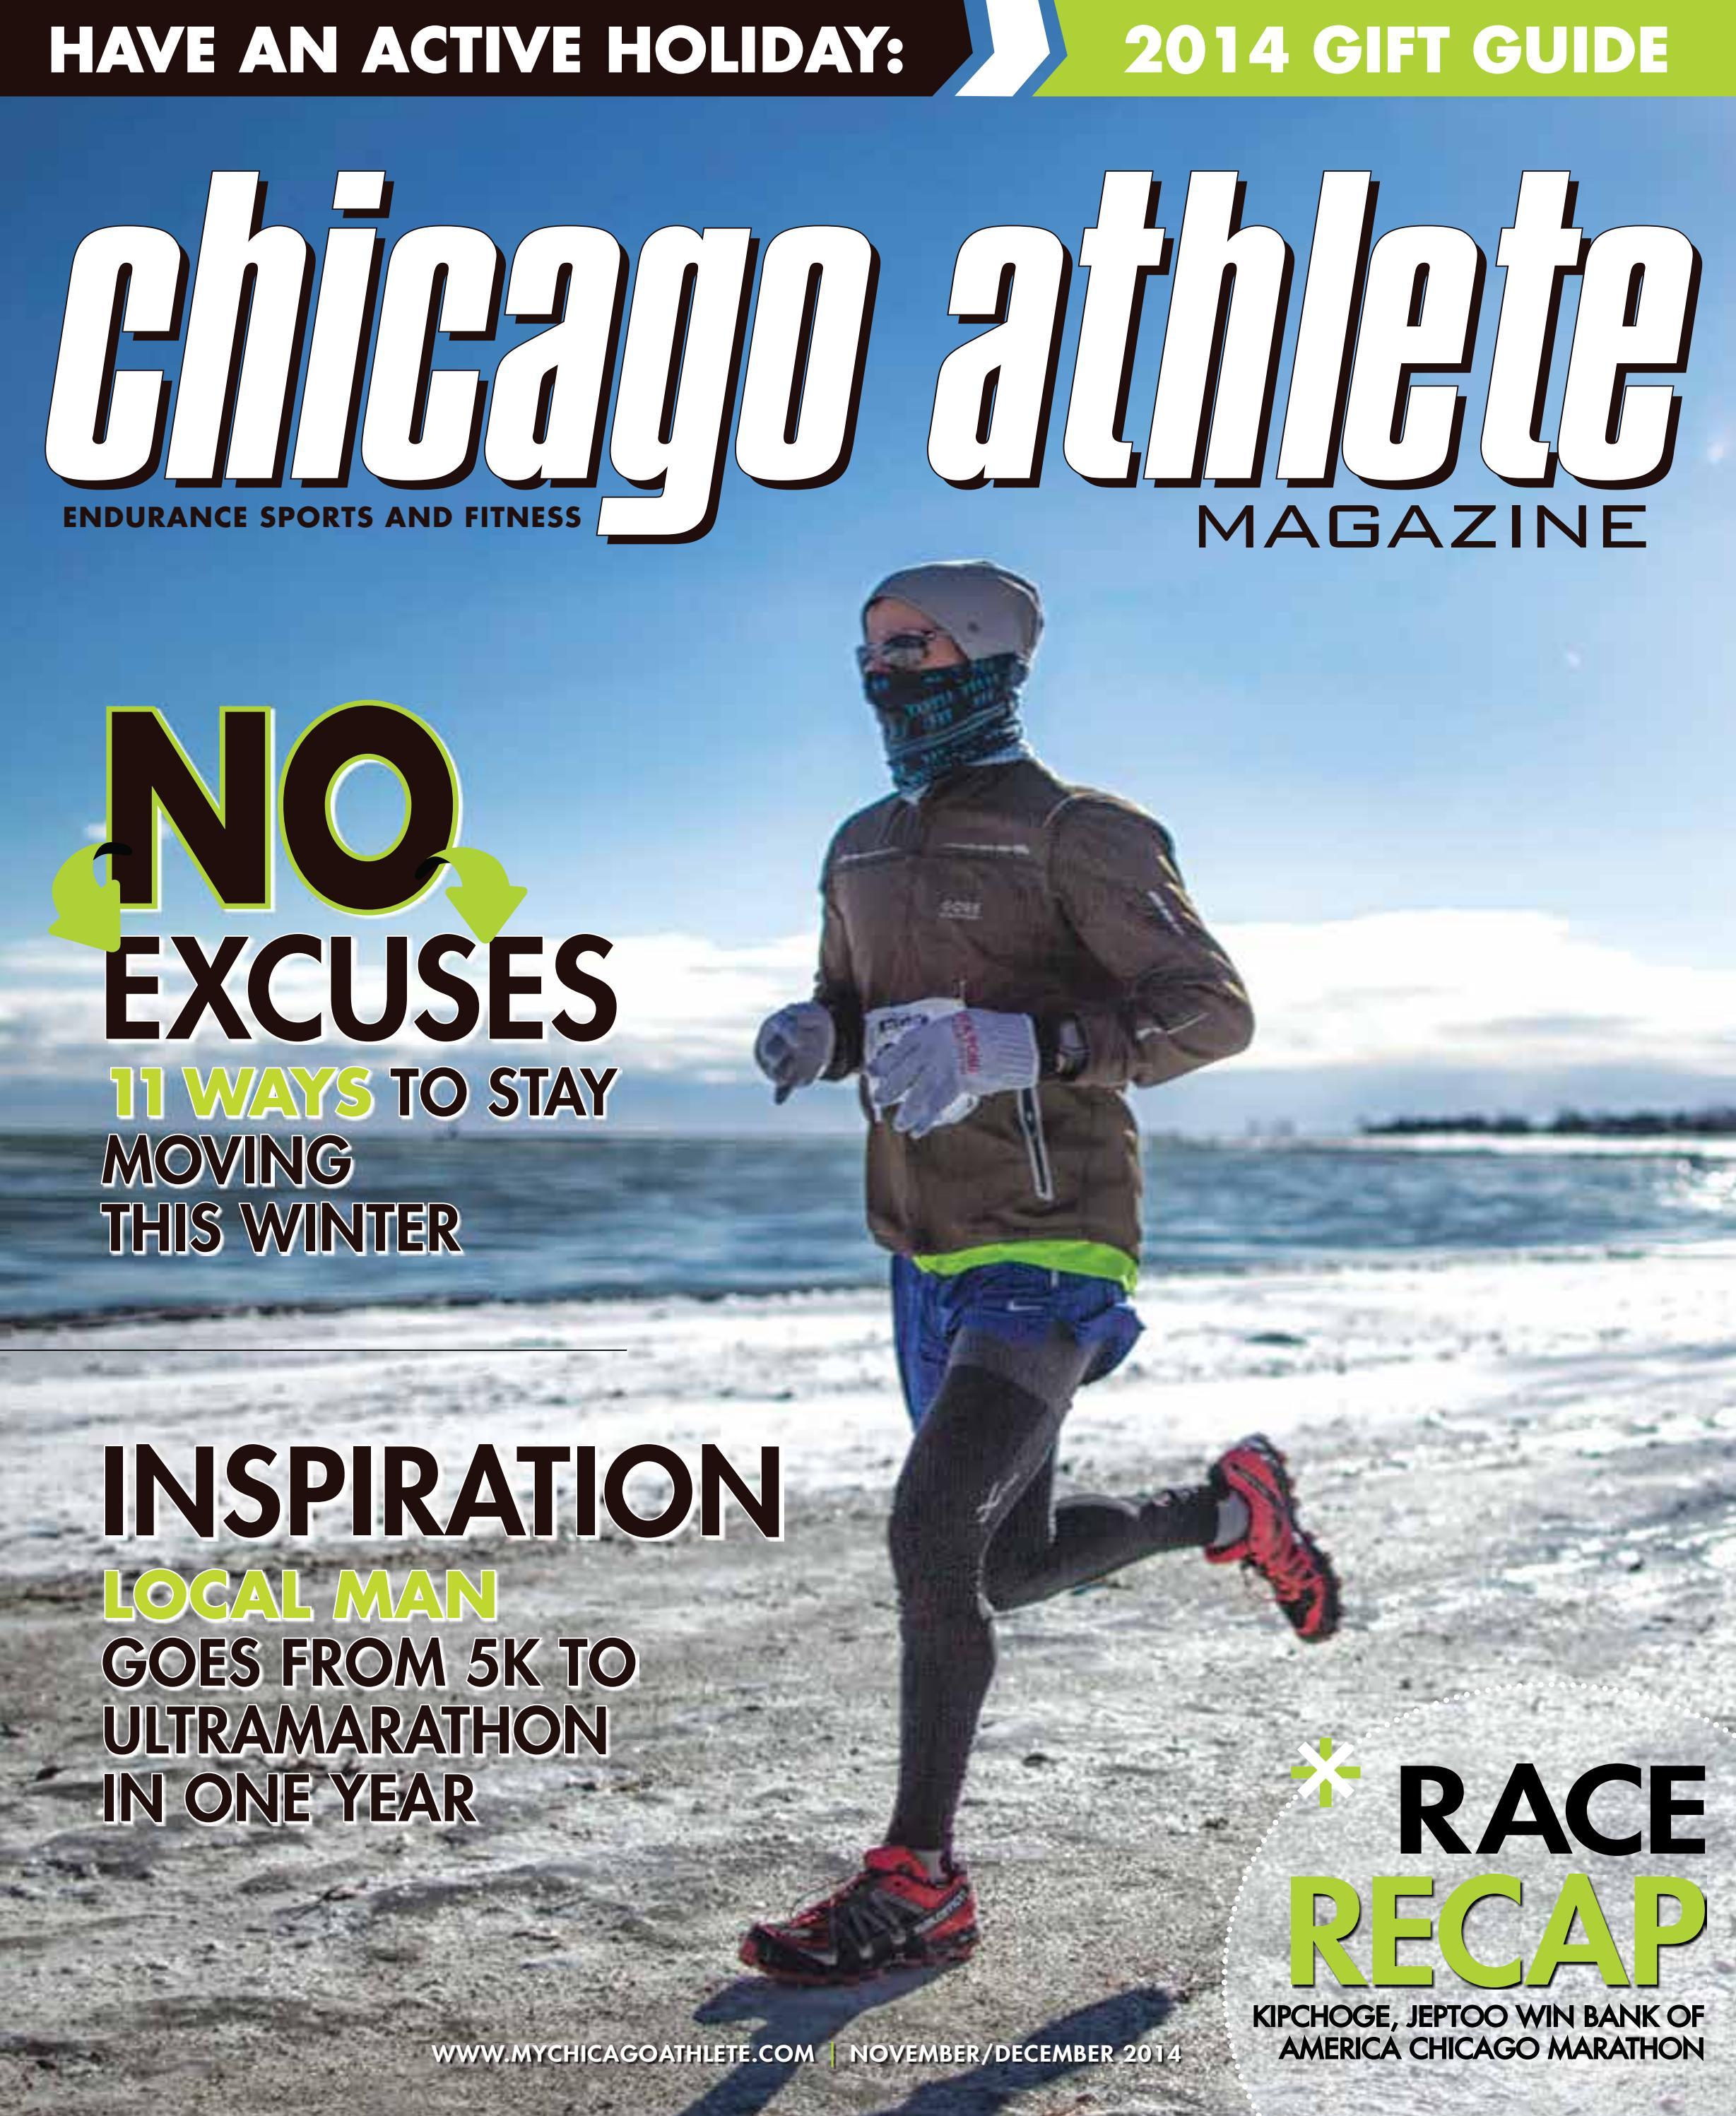 Chicago Athlete Magazine November/December 2014 Issue by